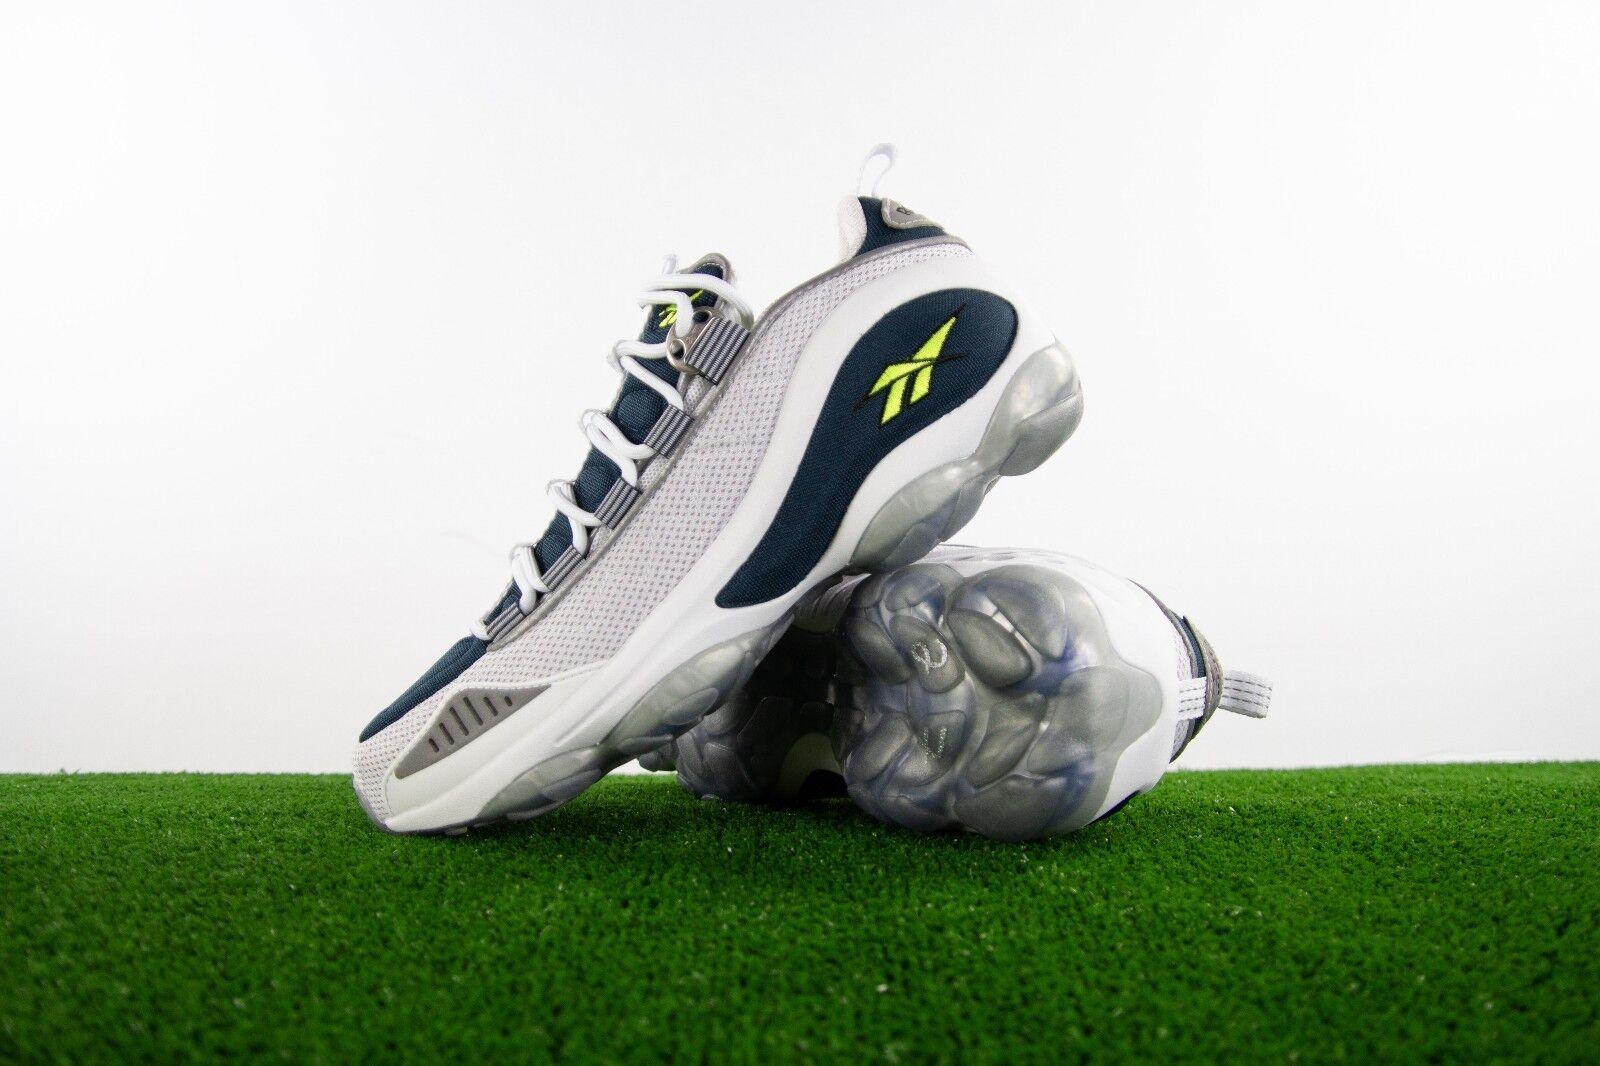 MEN'S SHOES SNEAKERS REEBOK DMX RUN 8.5 [V44398] sneaker head Premium 3m Classic